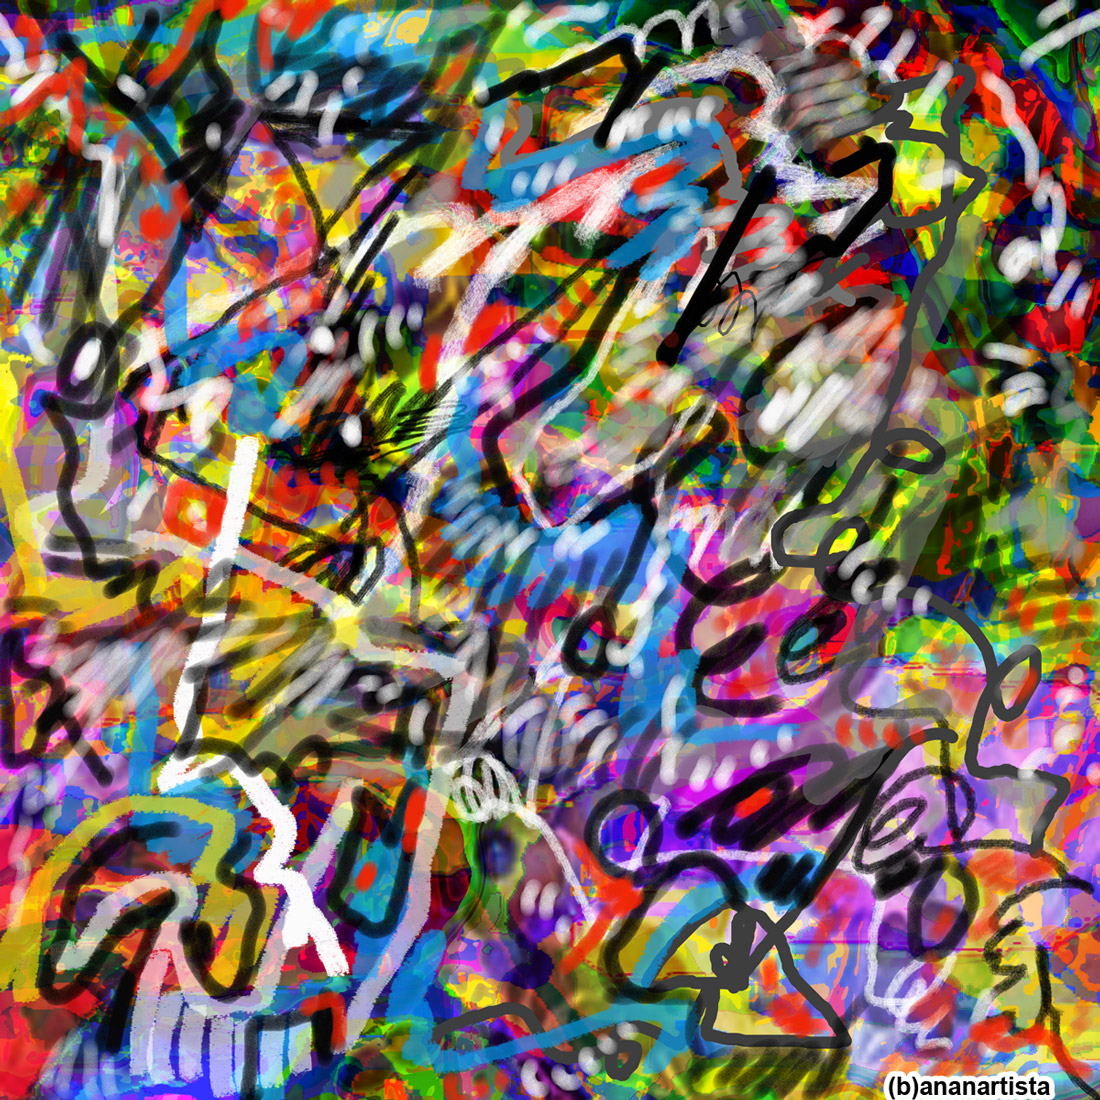 shamanic sexual healing: digital painting by (b)ananartista sbuff